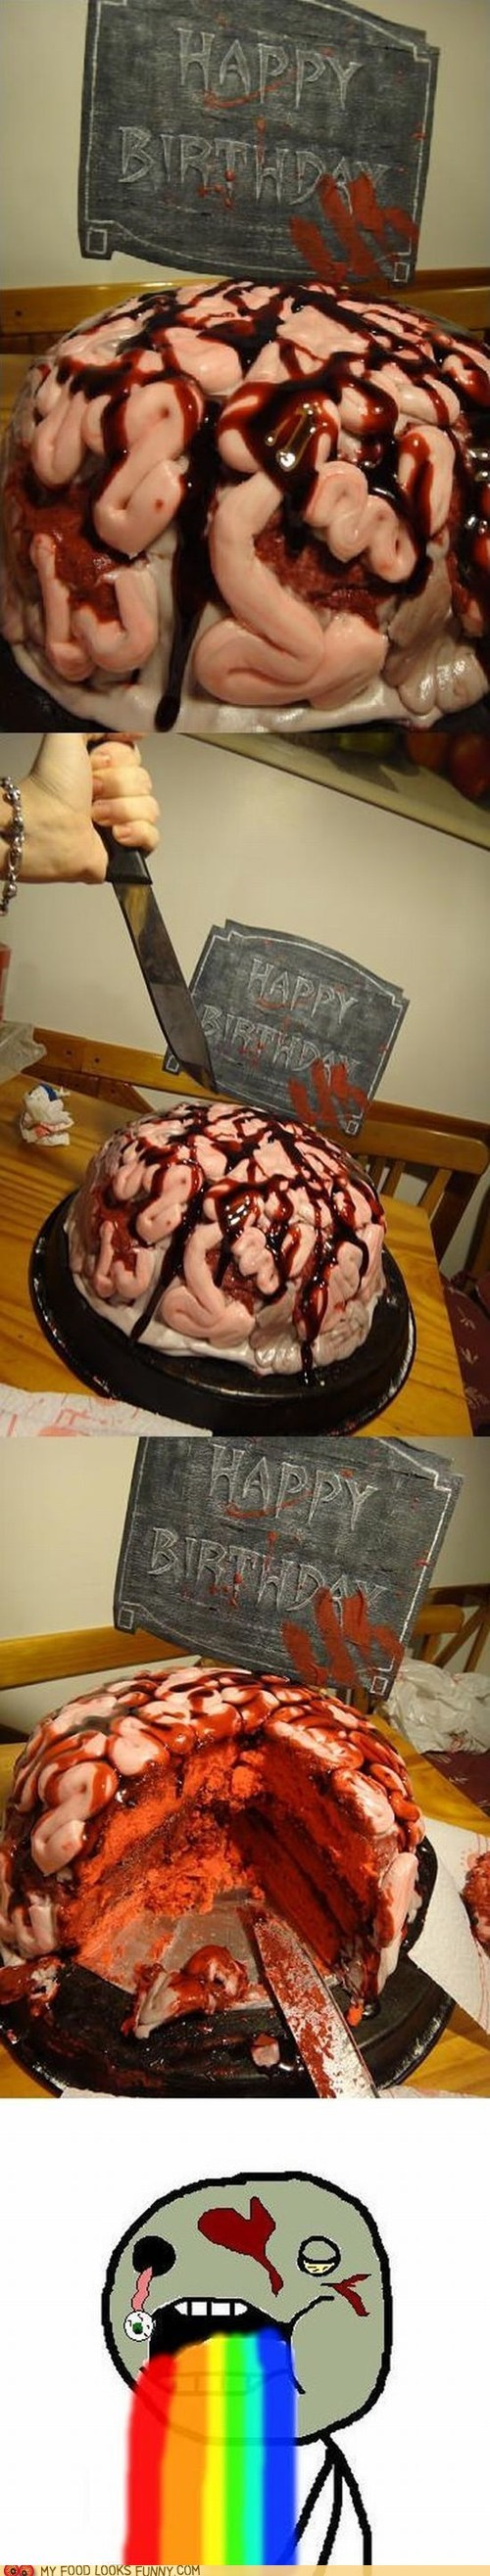 birthday,brain,cake,fondant,zombie